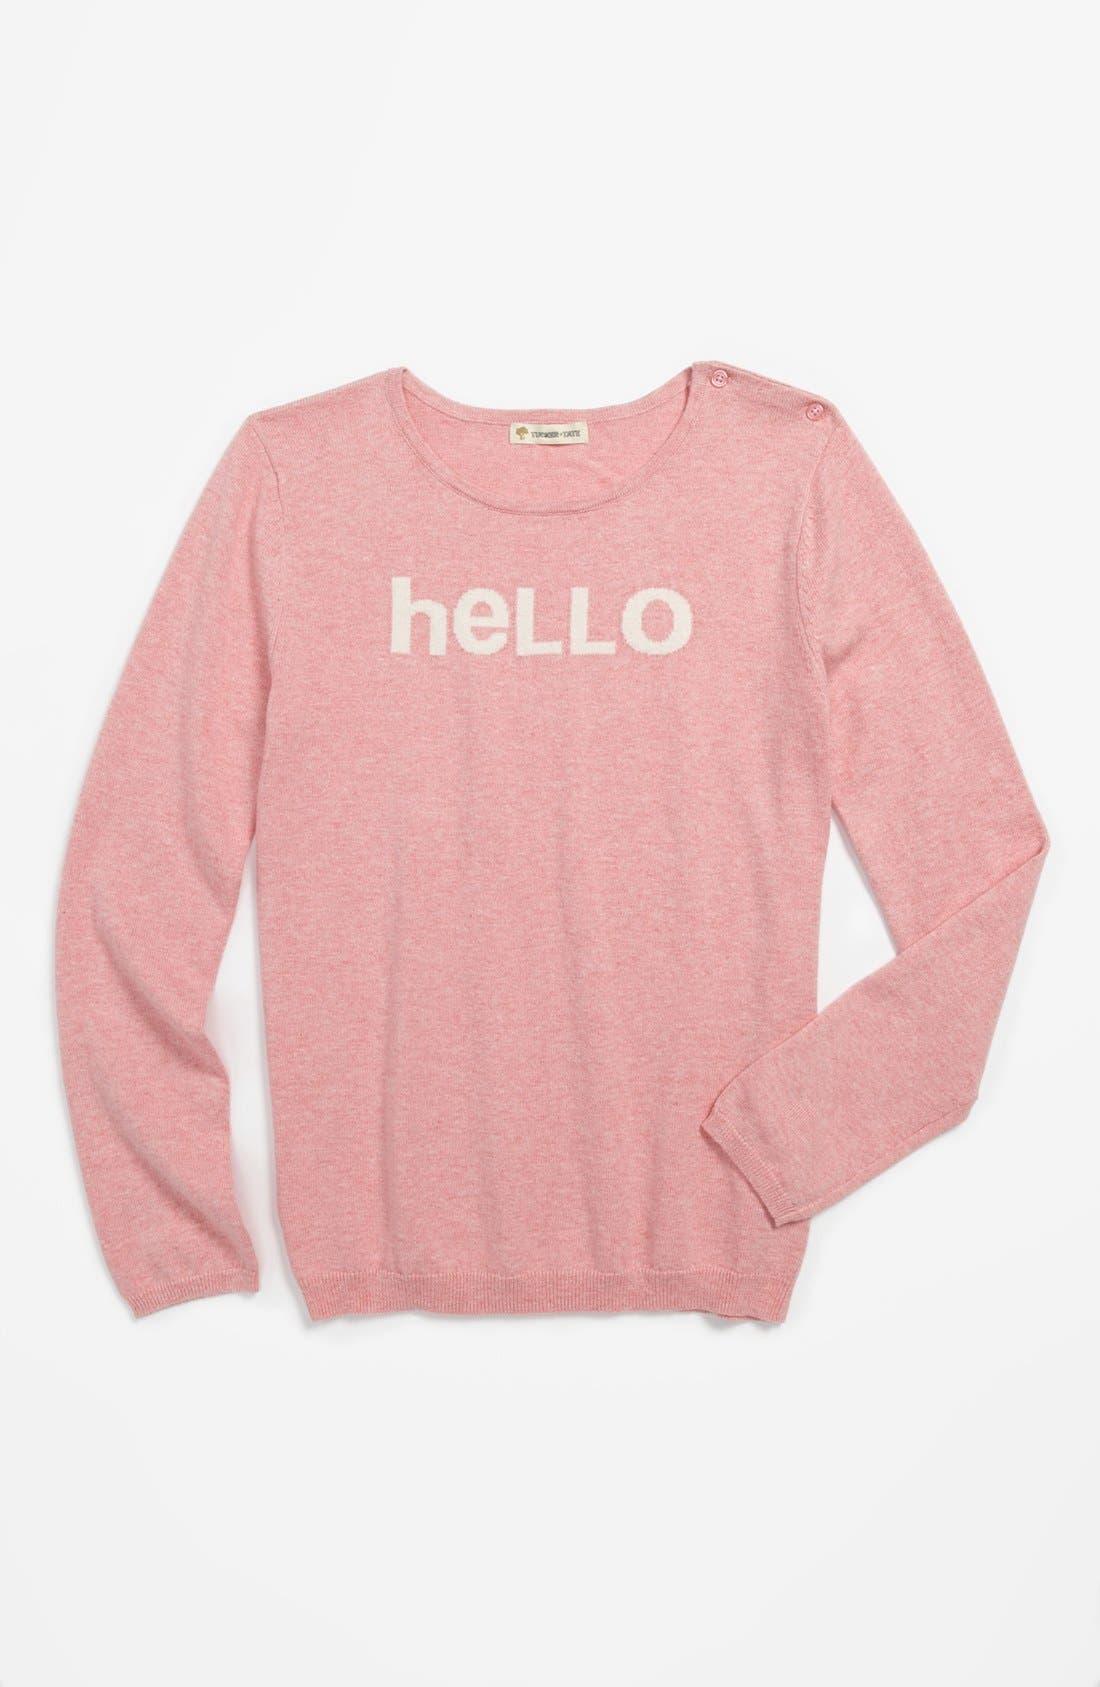 Main Image - Tucker + Tate 'Alexa' Intarsia Cotton & Cashmere Sweater (Big Girls)